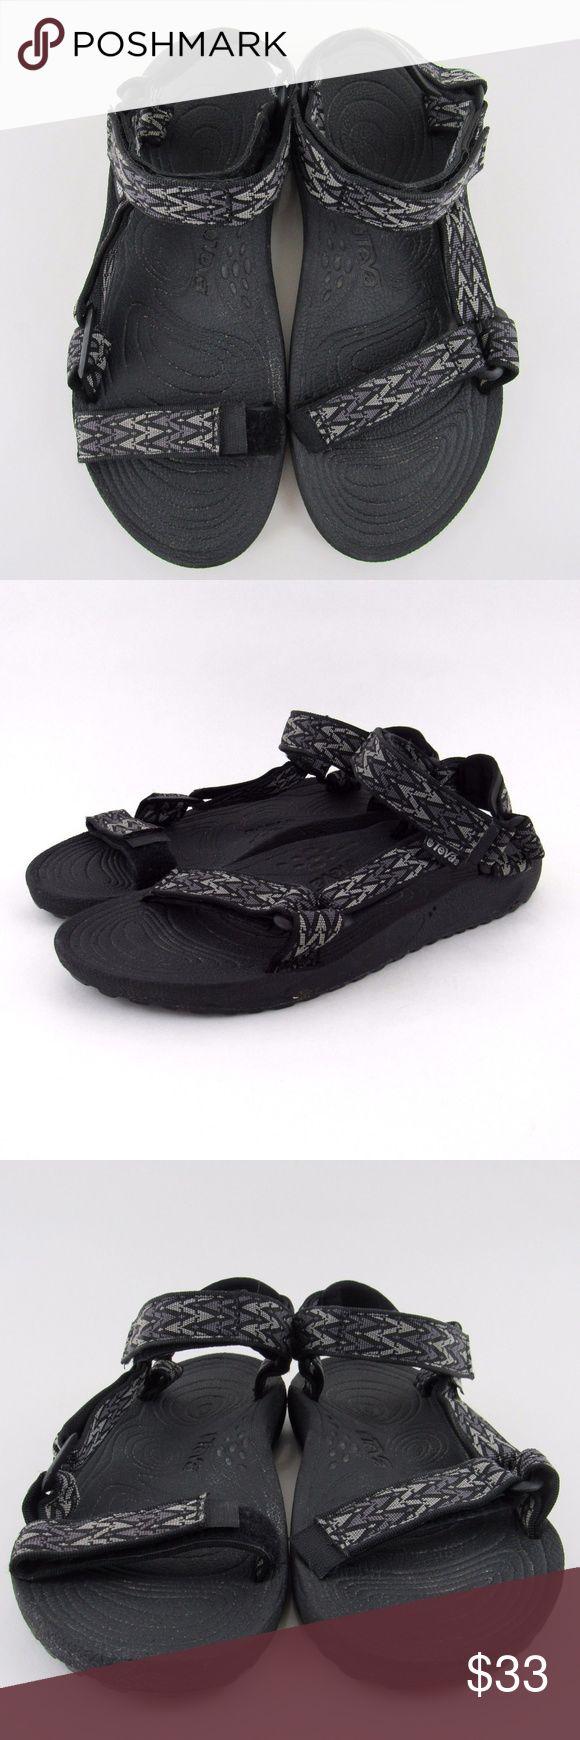 Teva Hurricane Sport Sandals Gray Black 6640 Teva Mens 10 Hurricane Sport Sandals Gray Black 6640 Hiking Rafting Water Shoes Teva Shoes Sandals & Flip-Flops